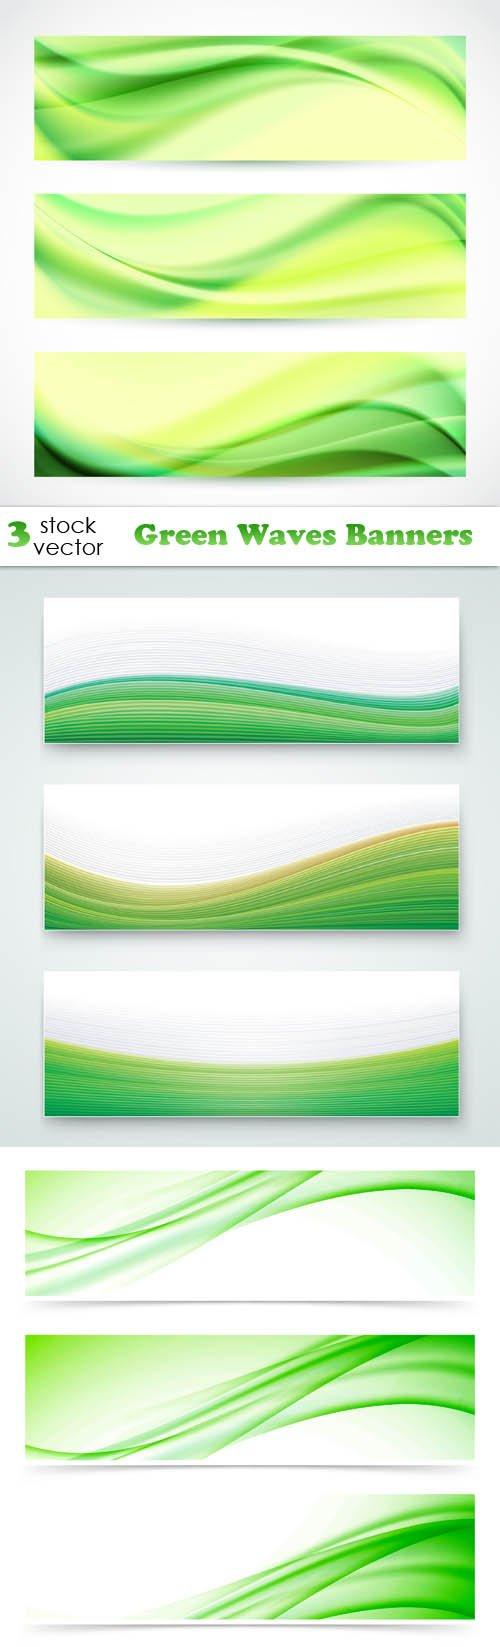 Vectors - Green Waves Banners